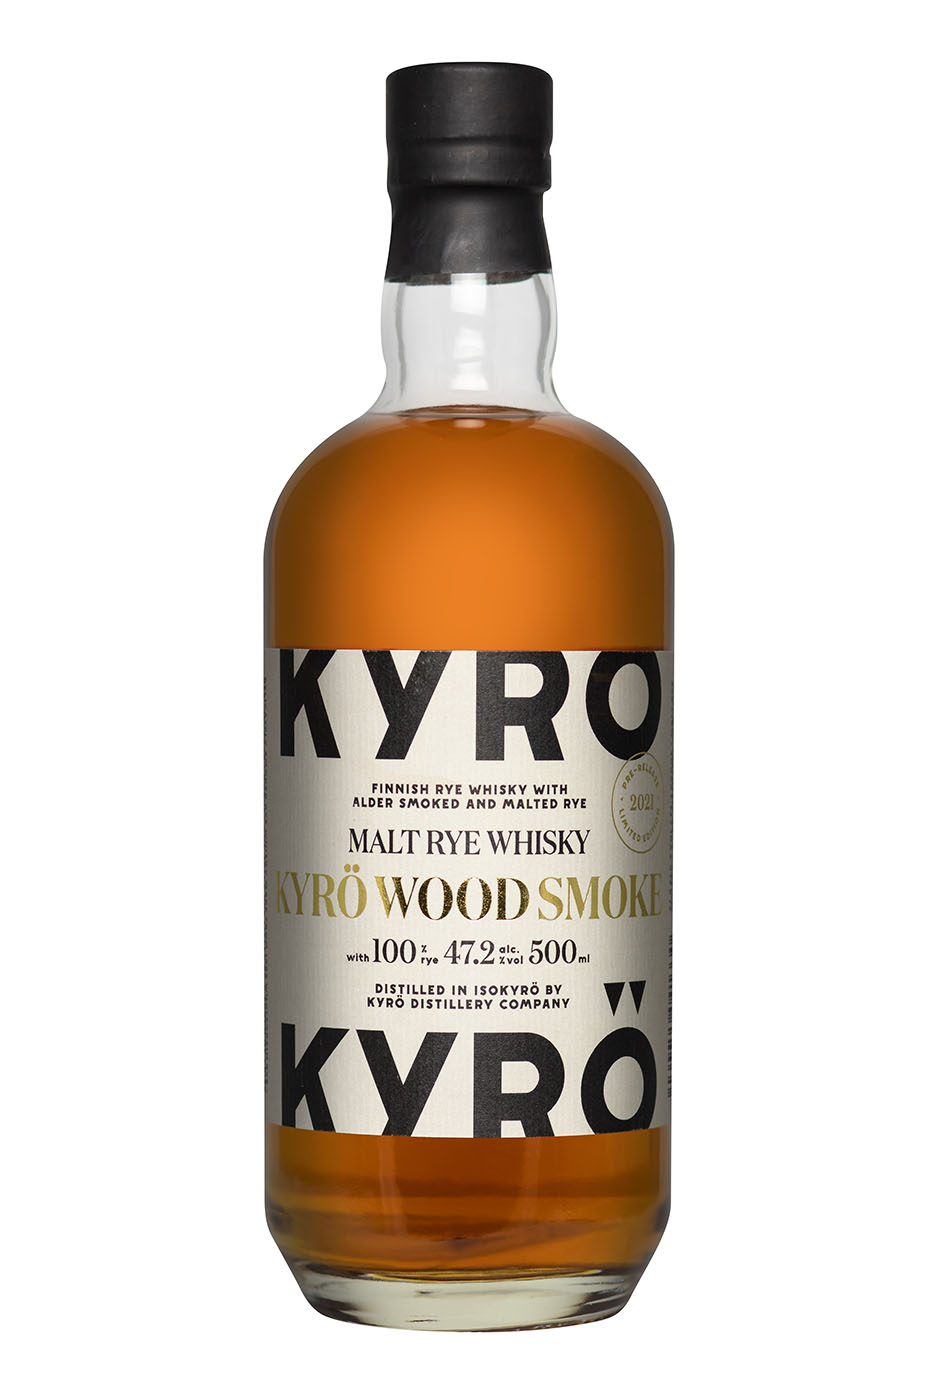 Kyrö Wood Smoke - Malt Rye Whisky 47,2% - 0,5l.